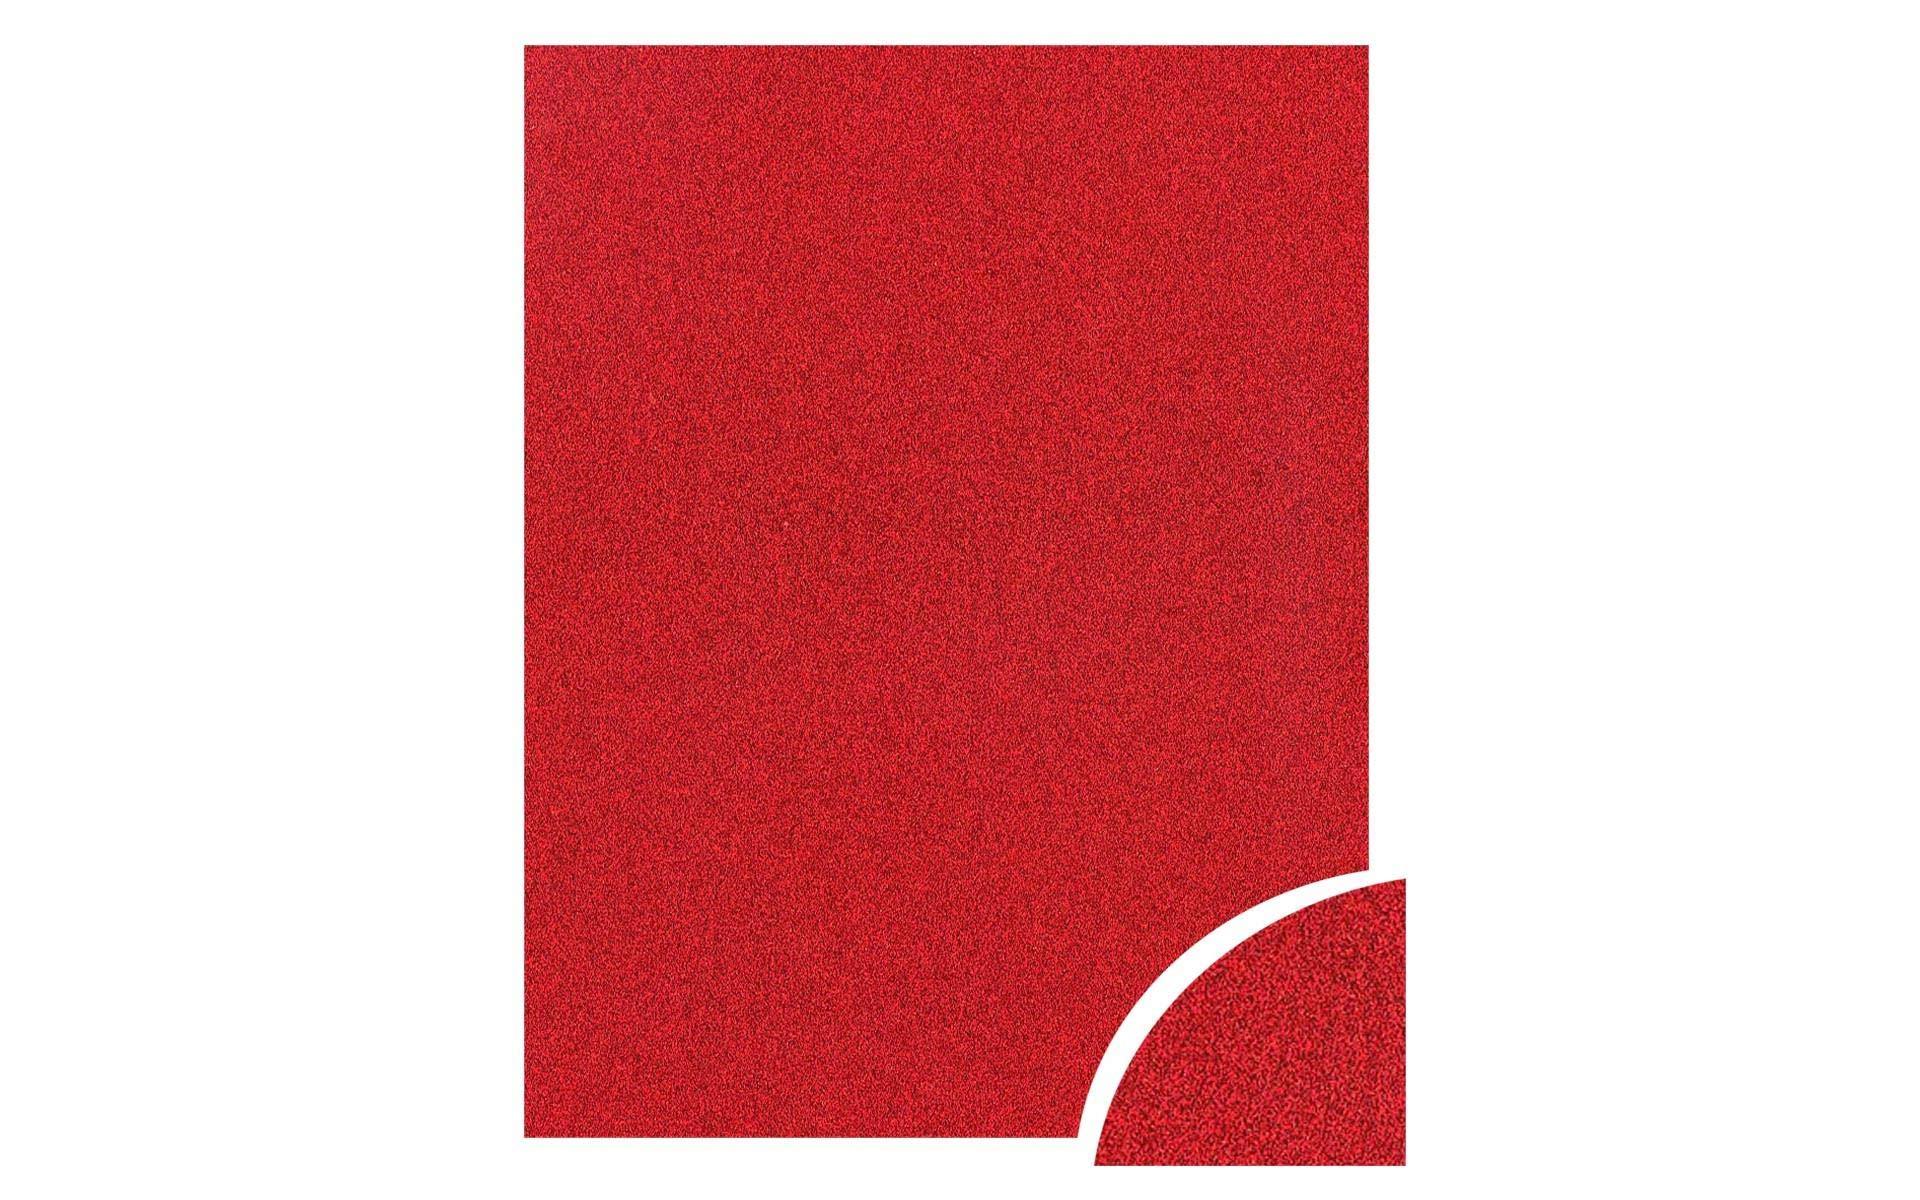 Paper Accents Cdstk Glitter 22x28 85lb Red UPC